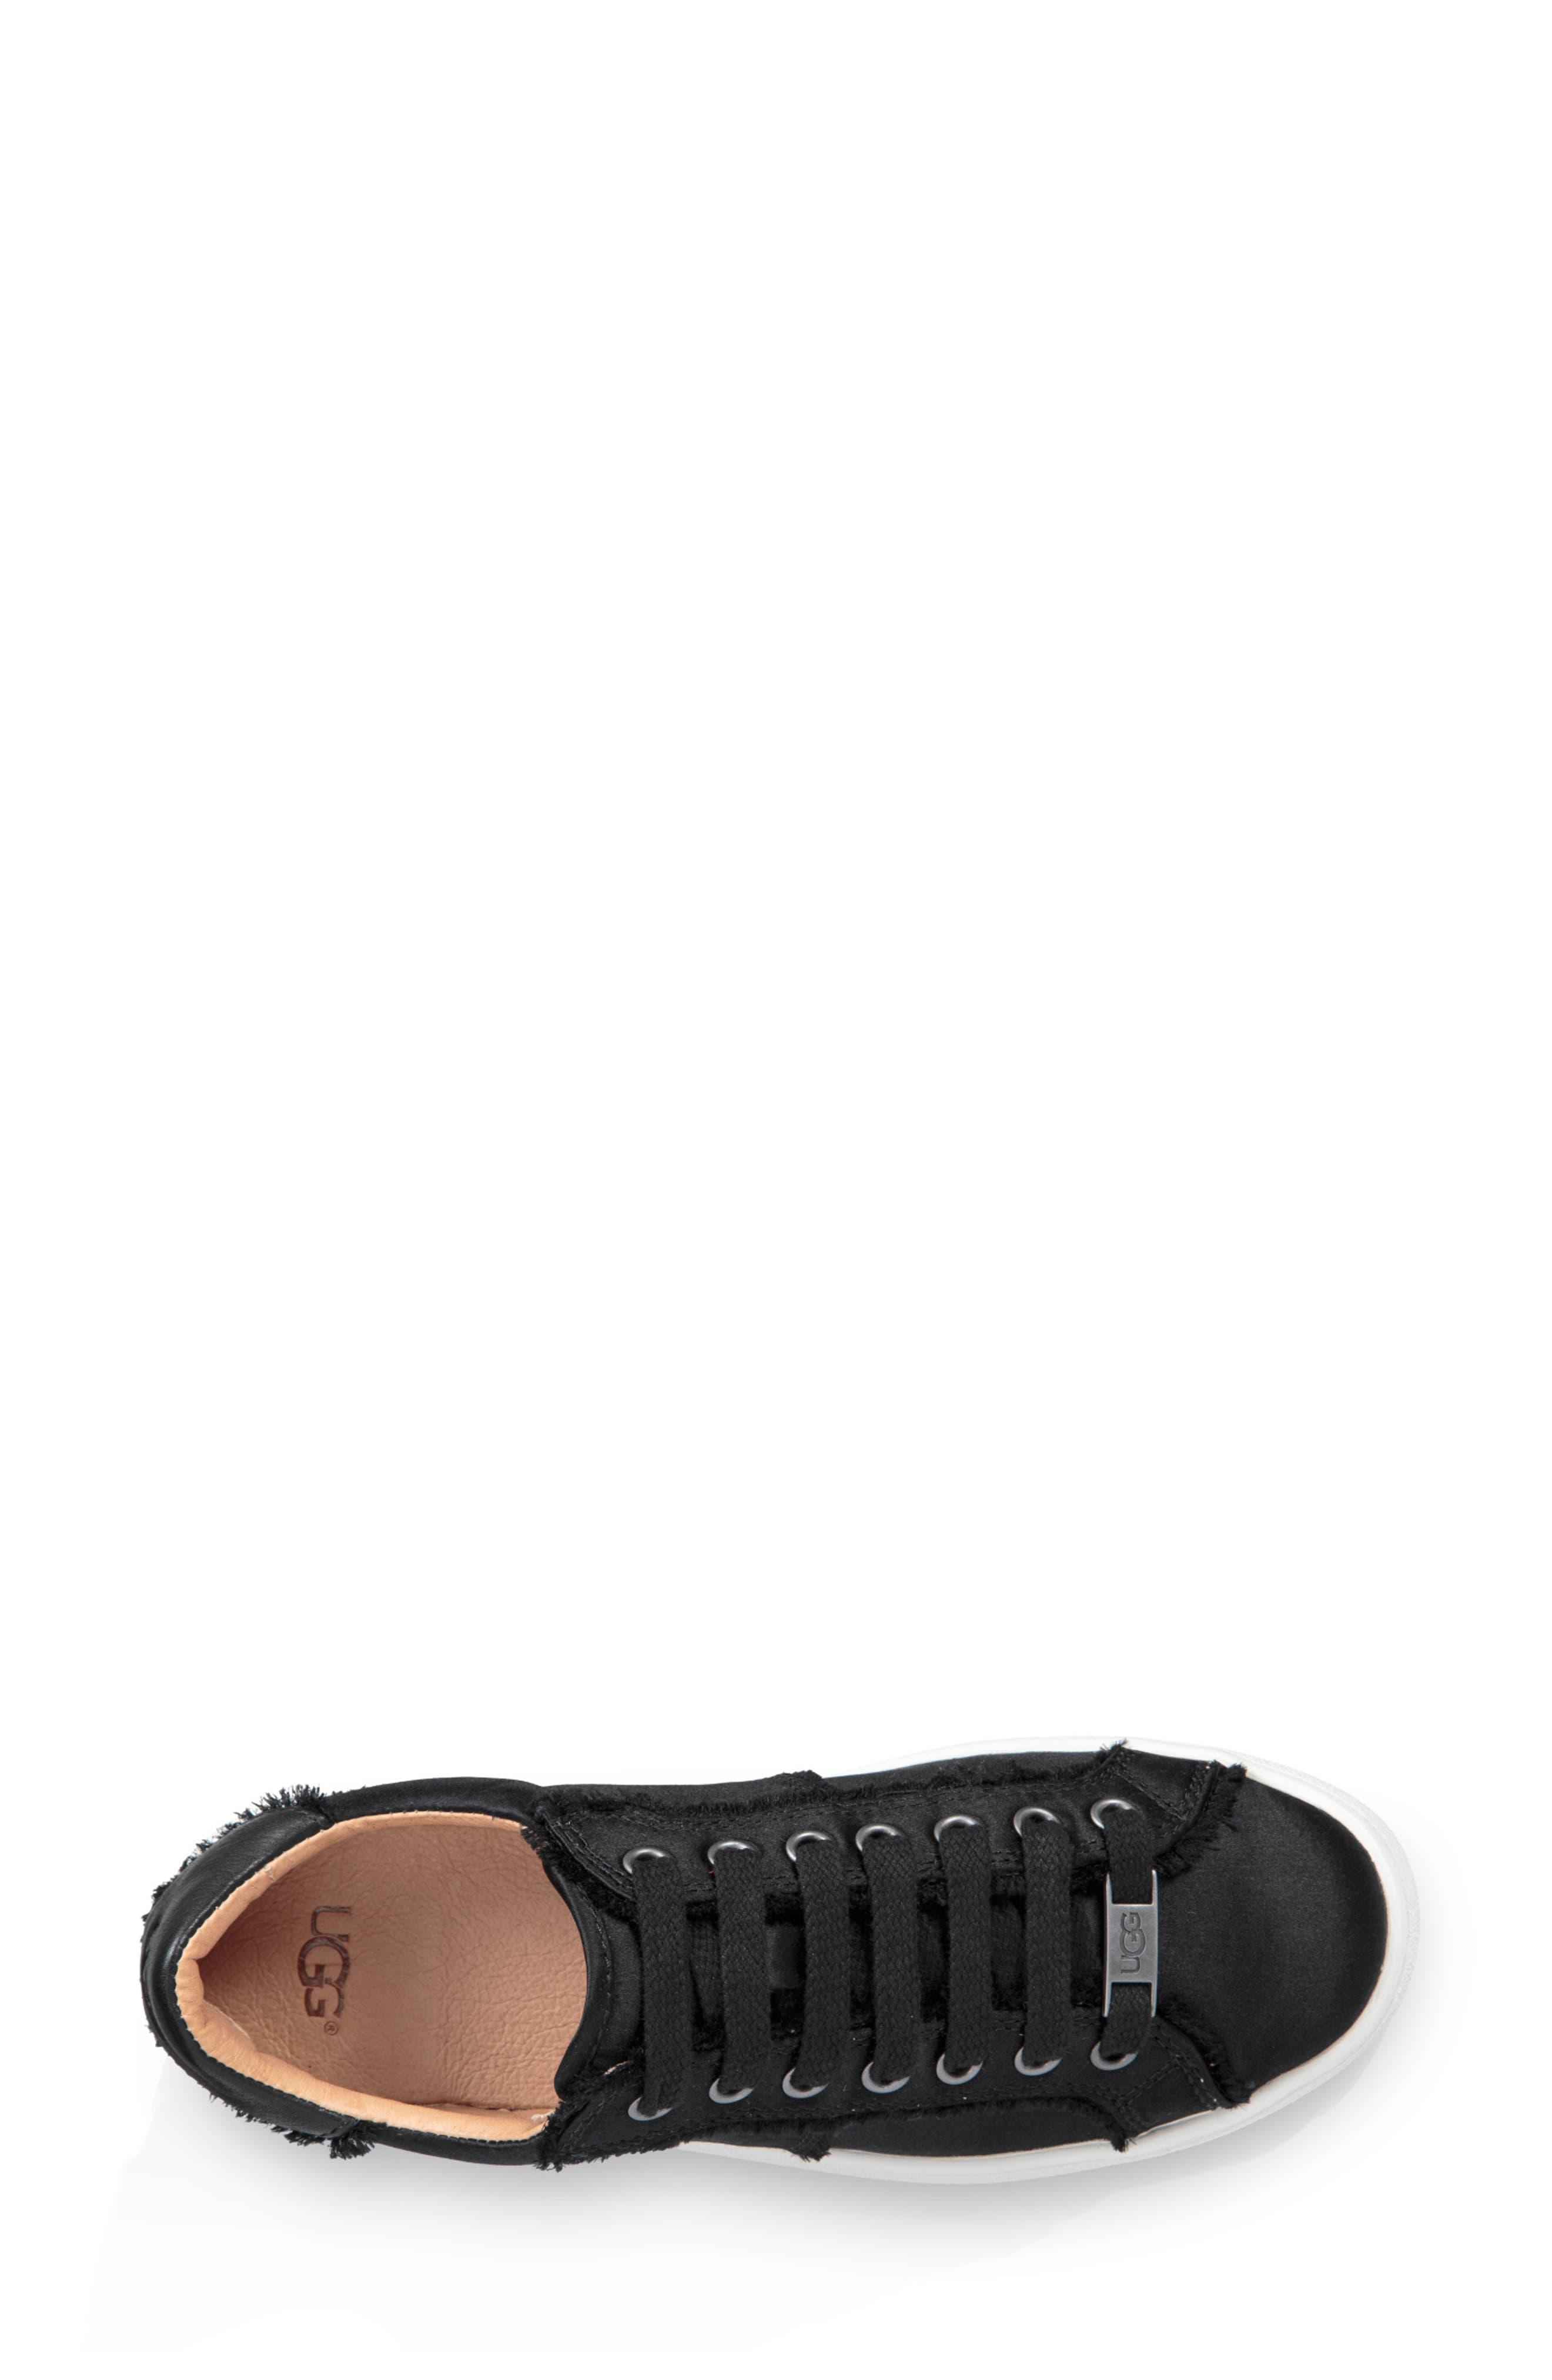 Milo Spill Seam Sneaker,                             Alternate thumbnail 4, color,                             BLACK FABRIC